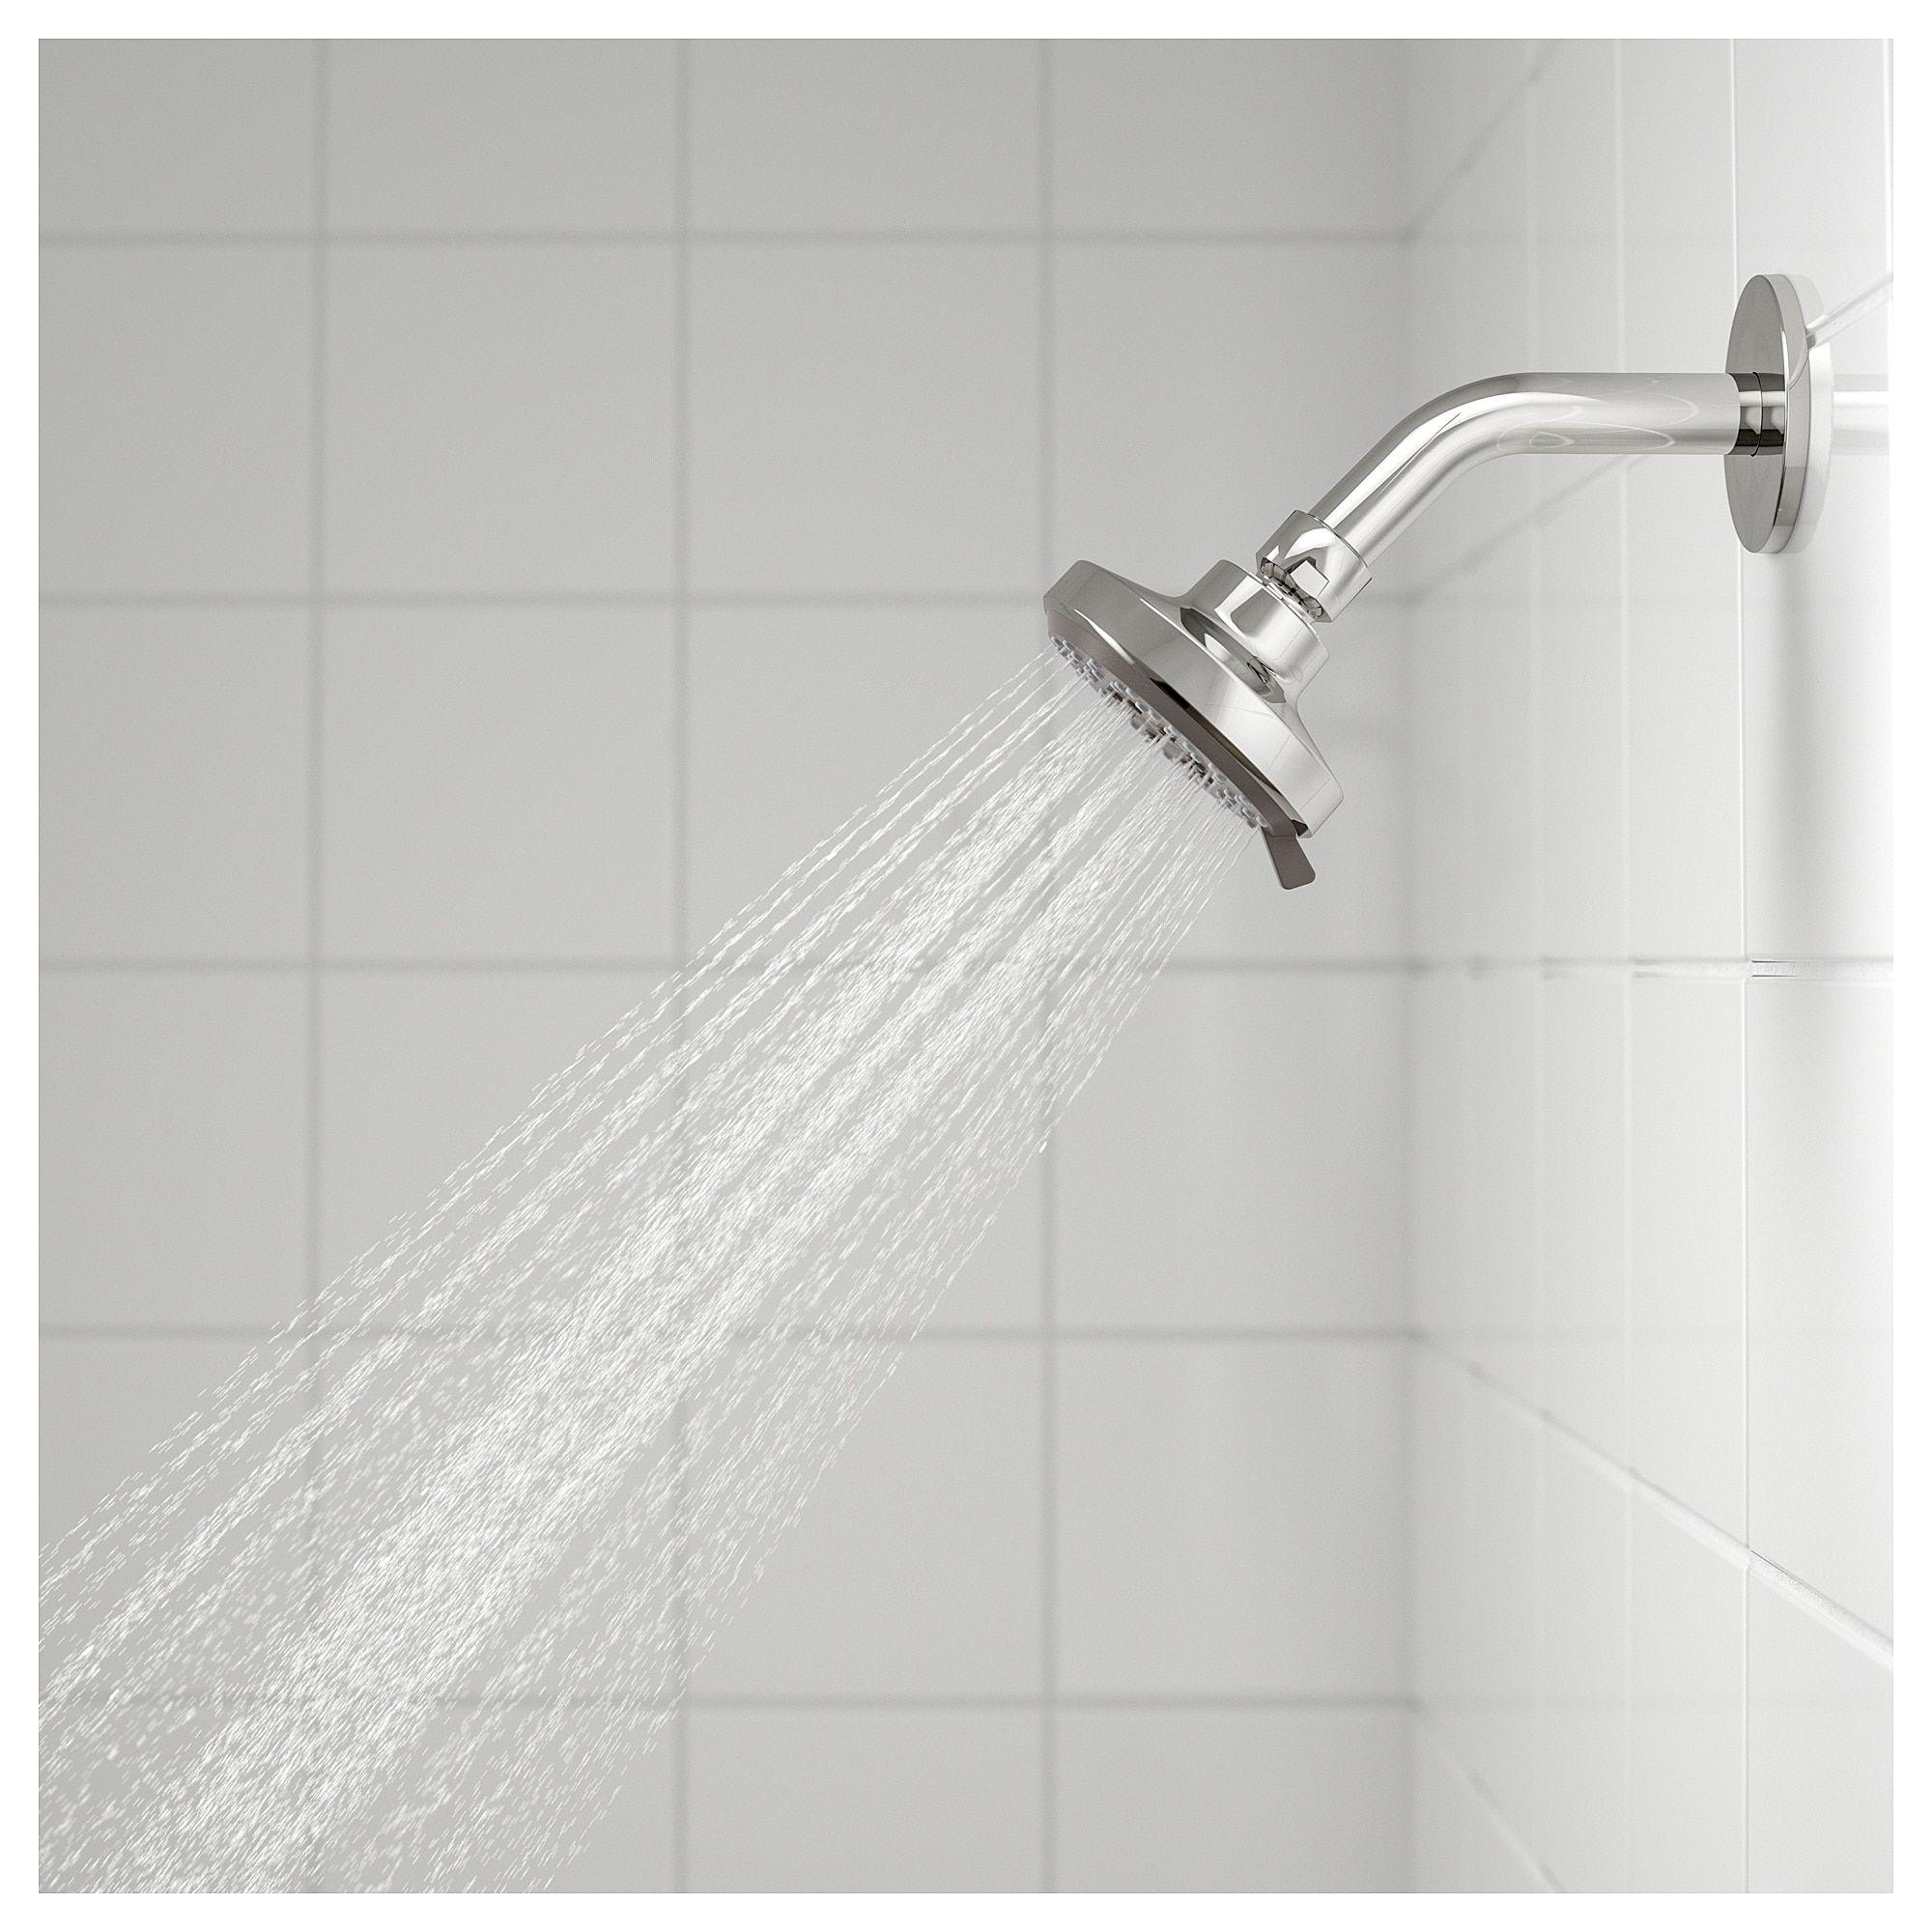 Ikea Brogrund Bath Shower Set Thermostatic Faucet Chrome Plated